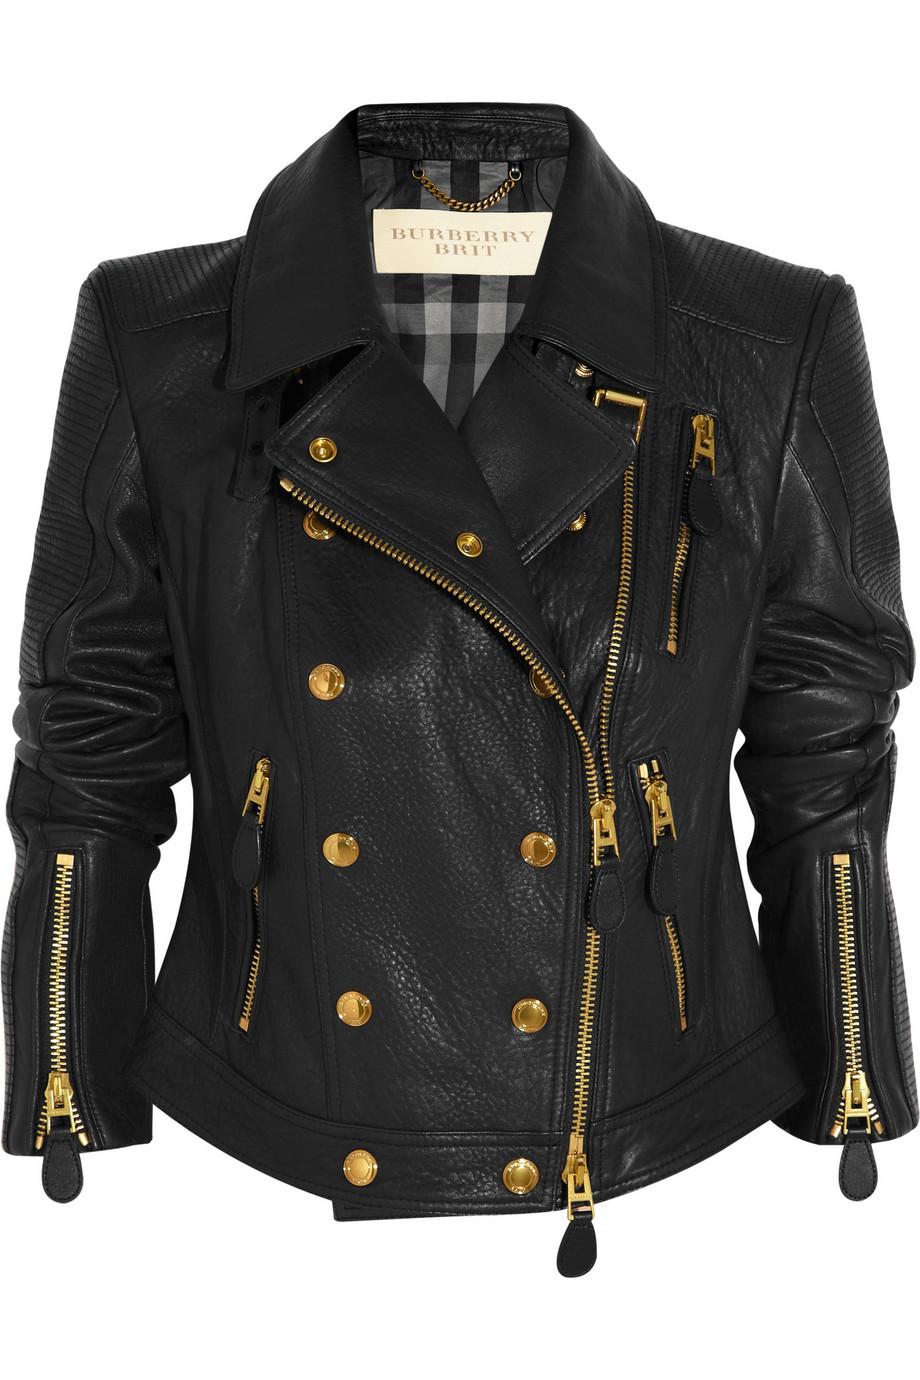 lyst burberry brit cropped textured leather biker jacket in black. Black Bedroom Furniture Sets. Home Design Ideas